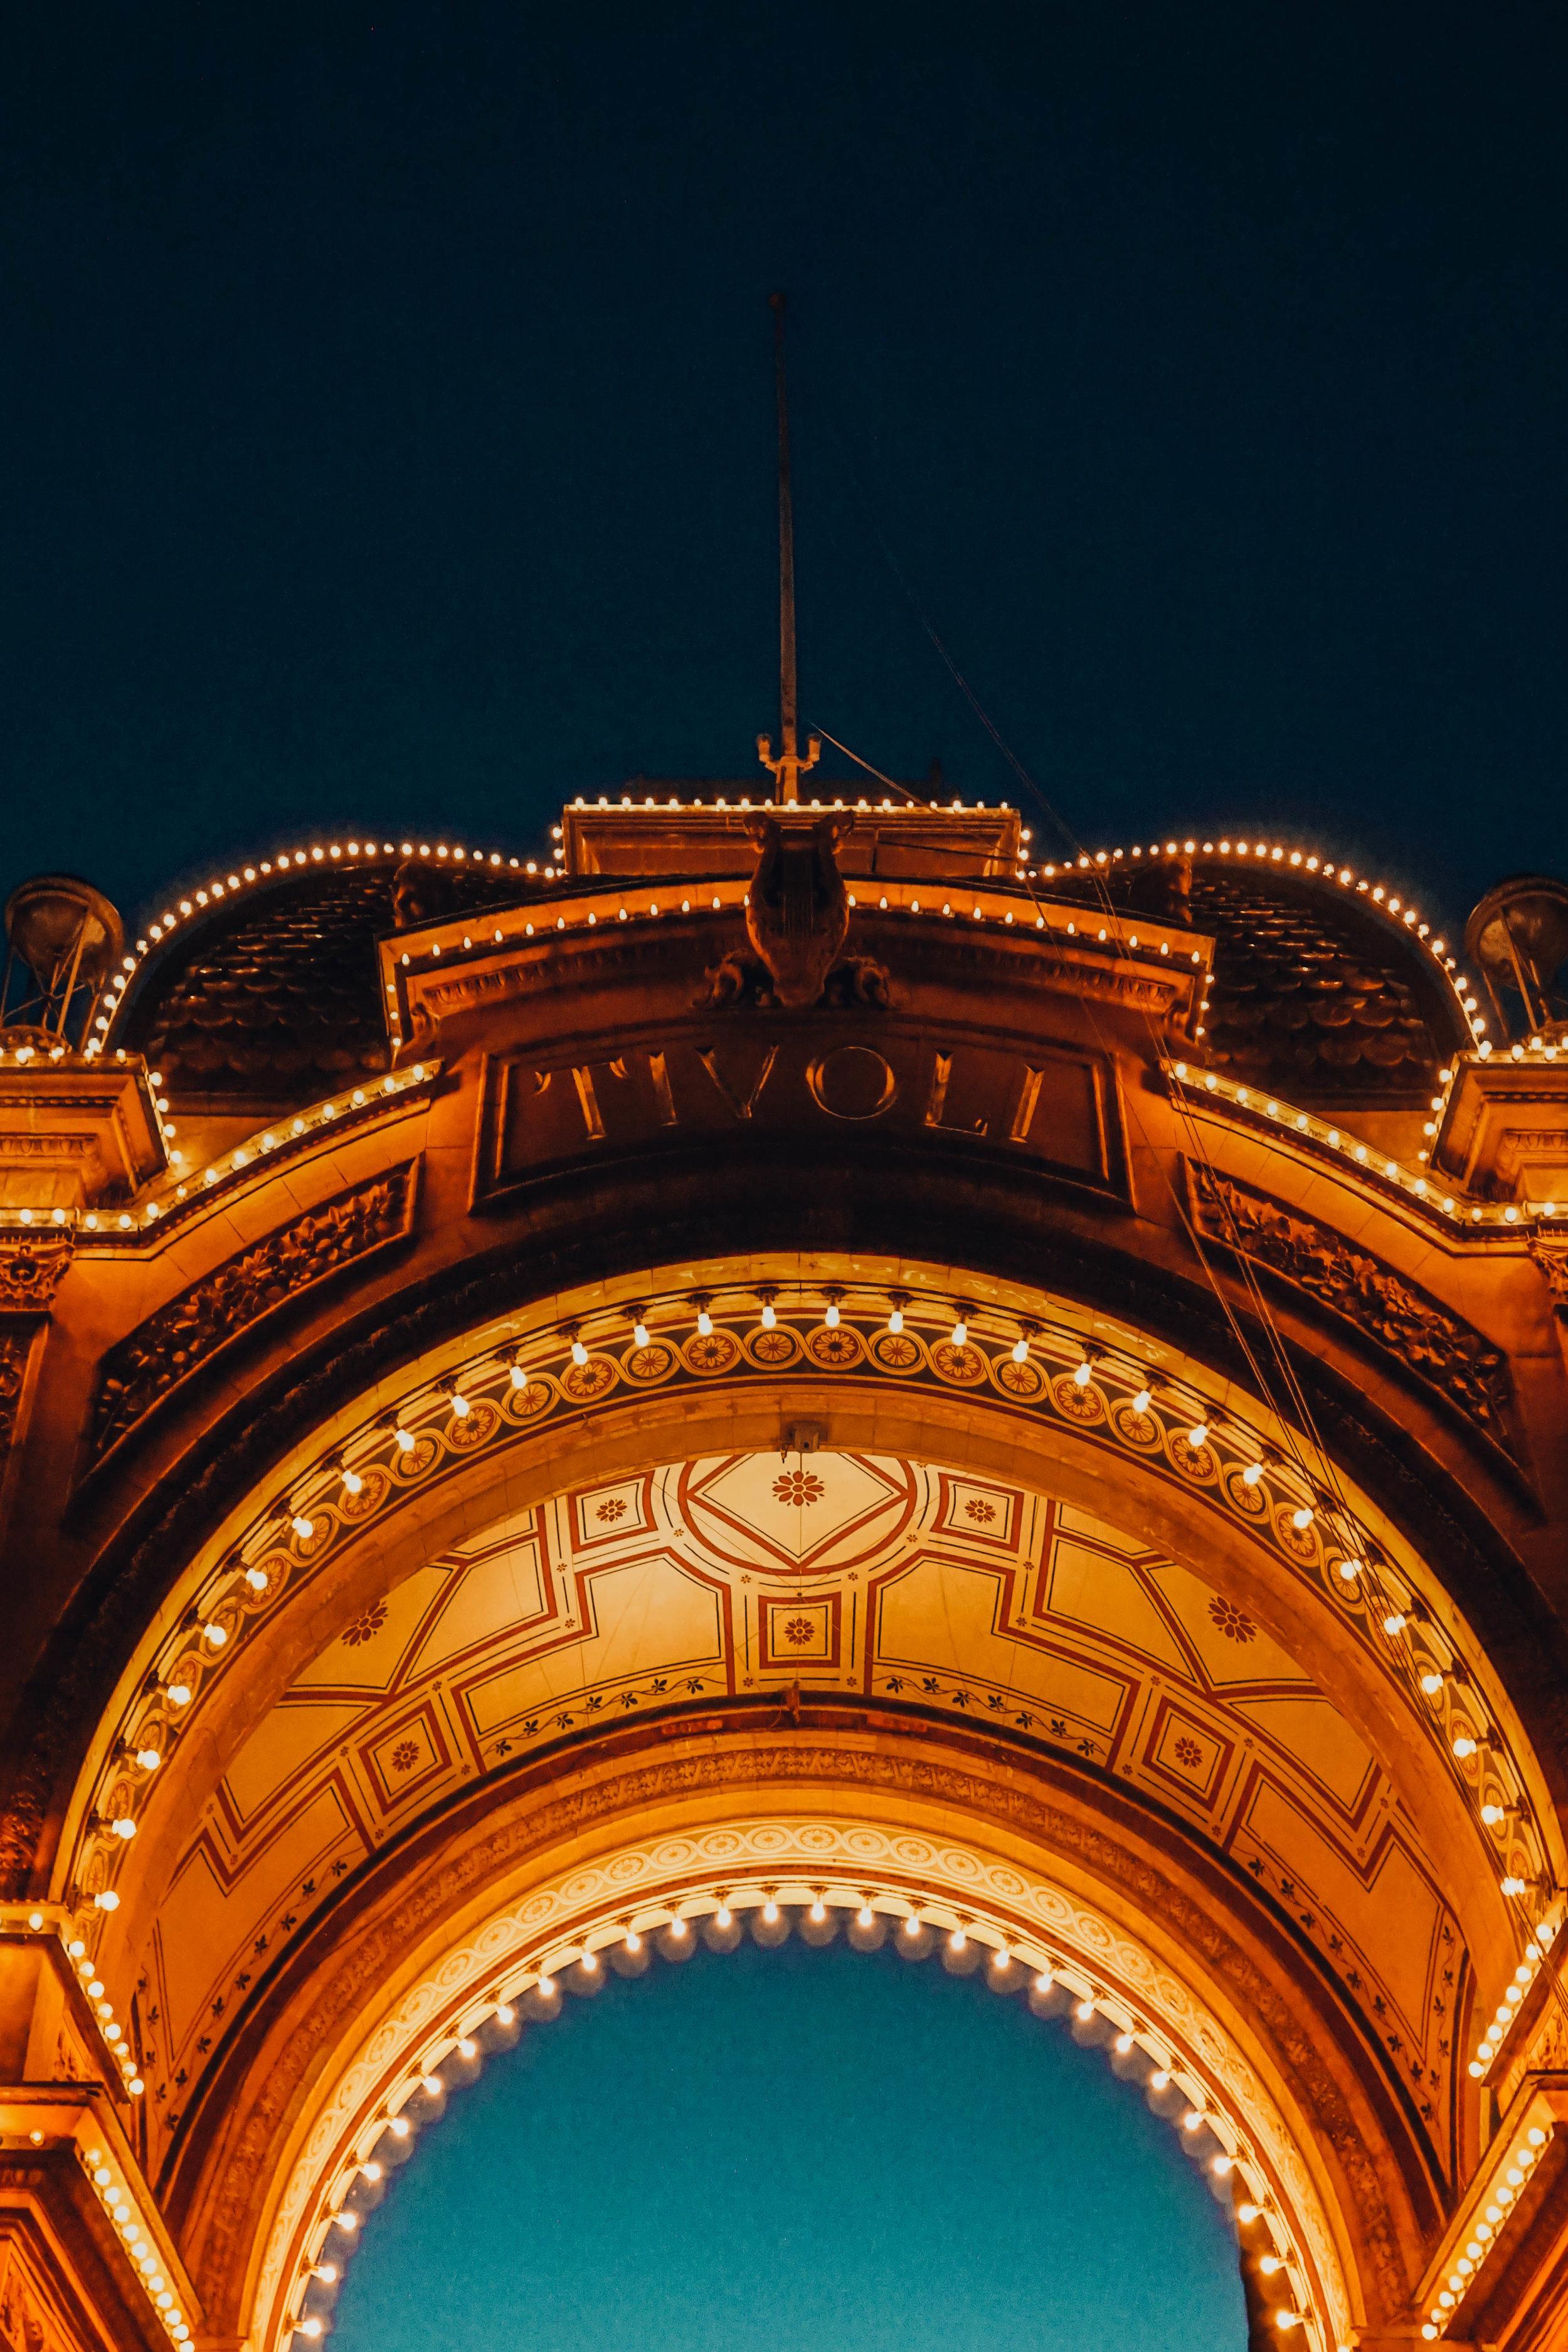 The archways to Tivoli at night.